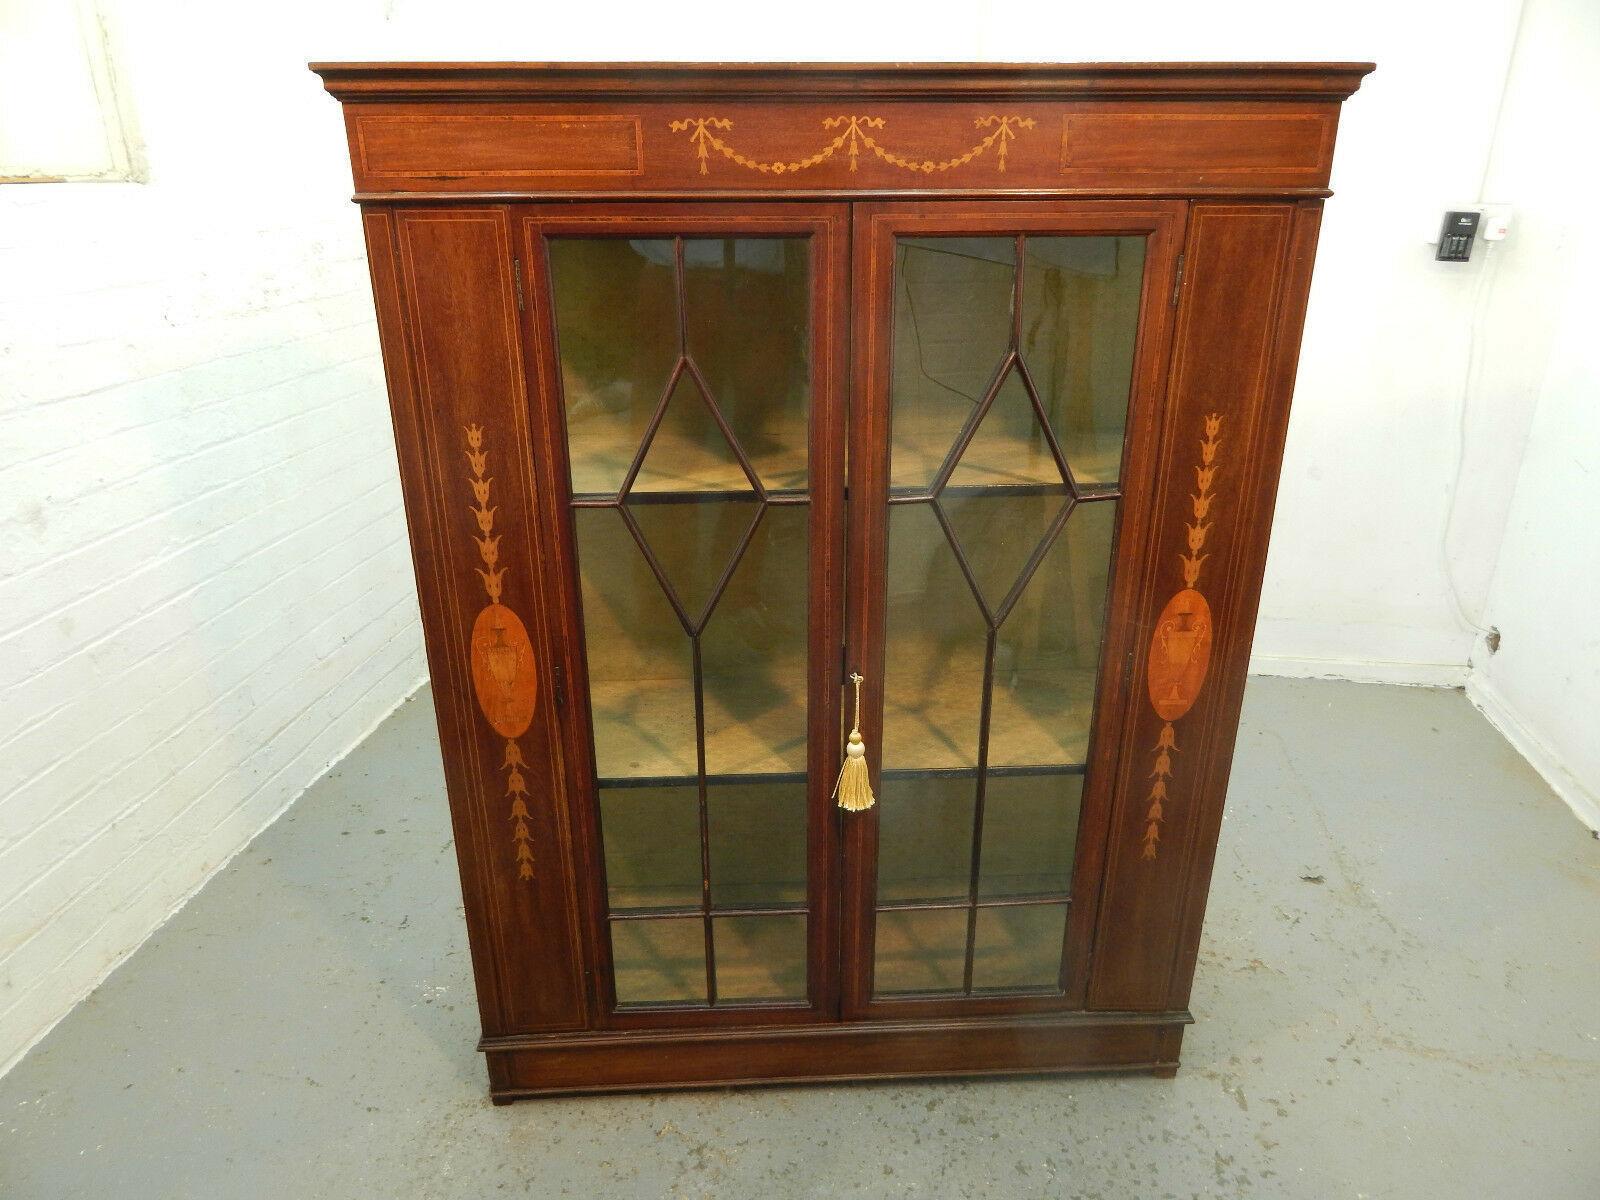 Antique Mahogany Bookcase Cabinet Inlaid Glazed Shelves 2 Door Glazed Sides Vinterior